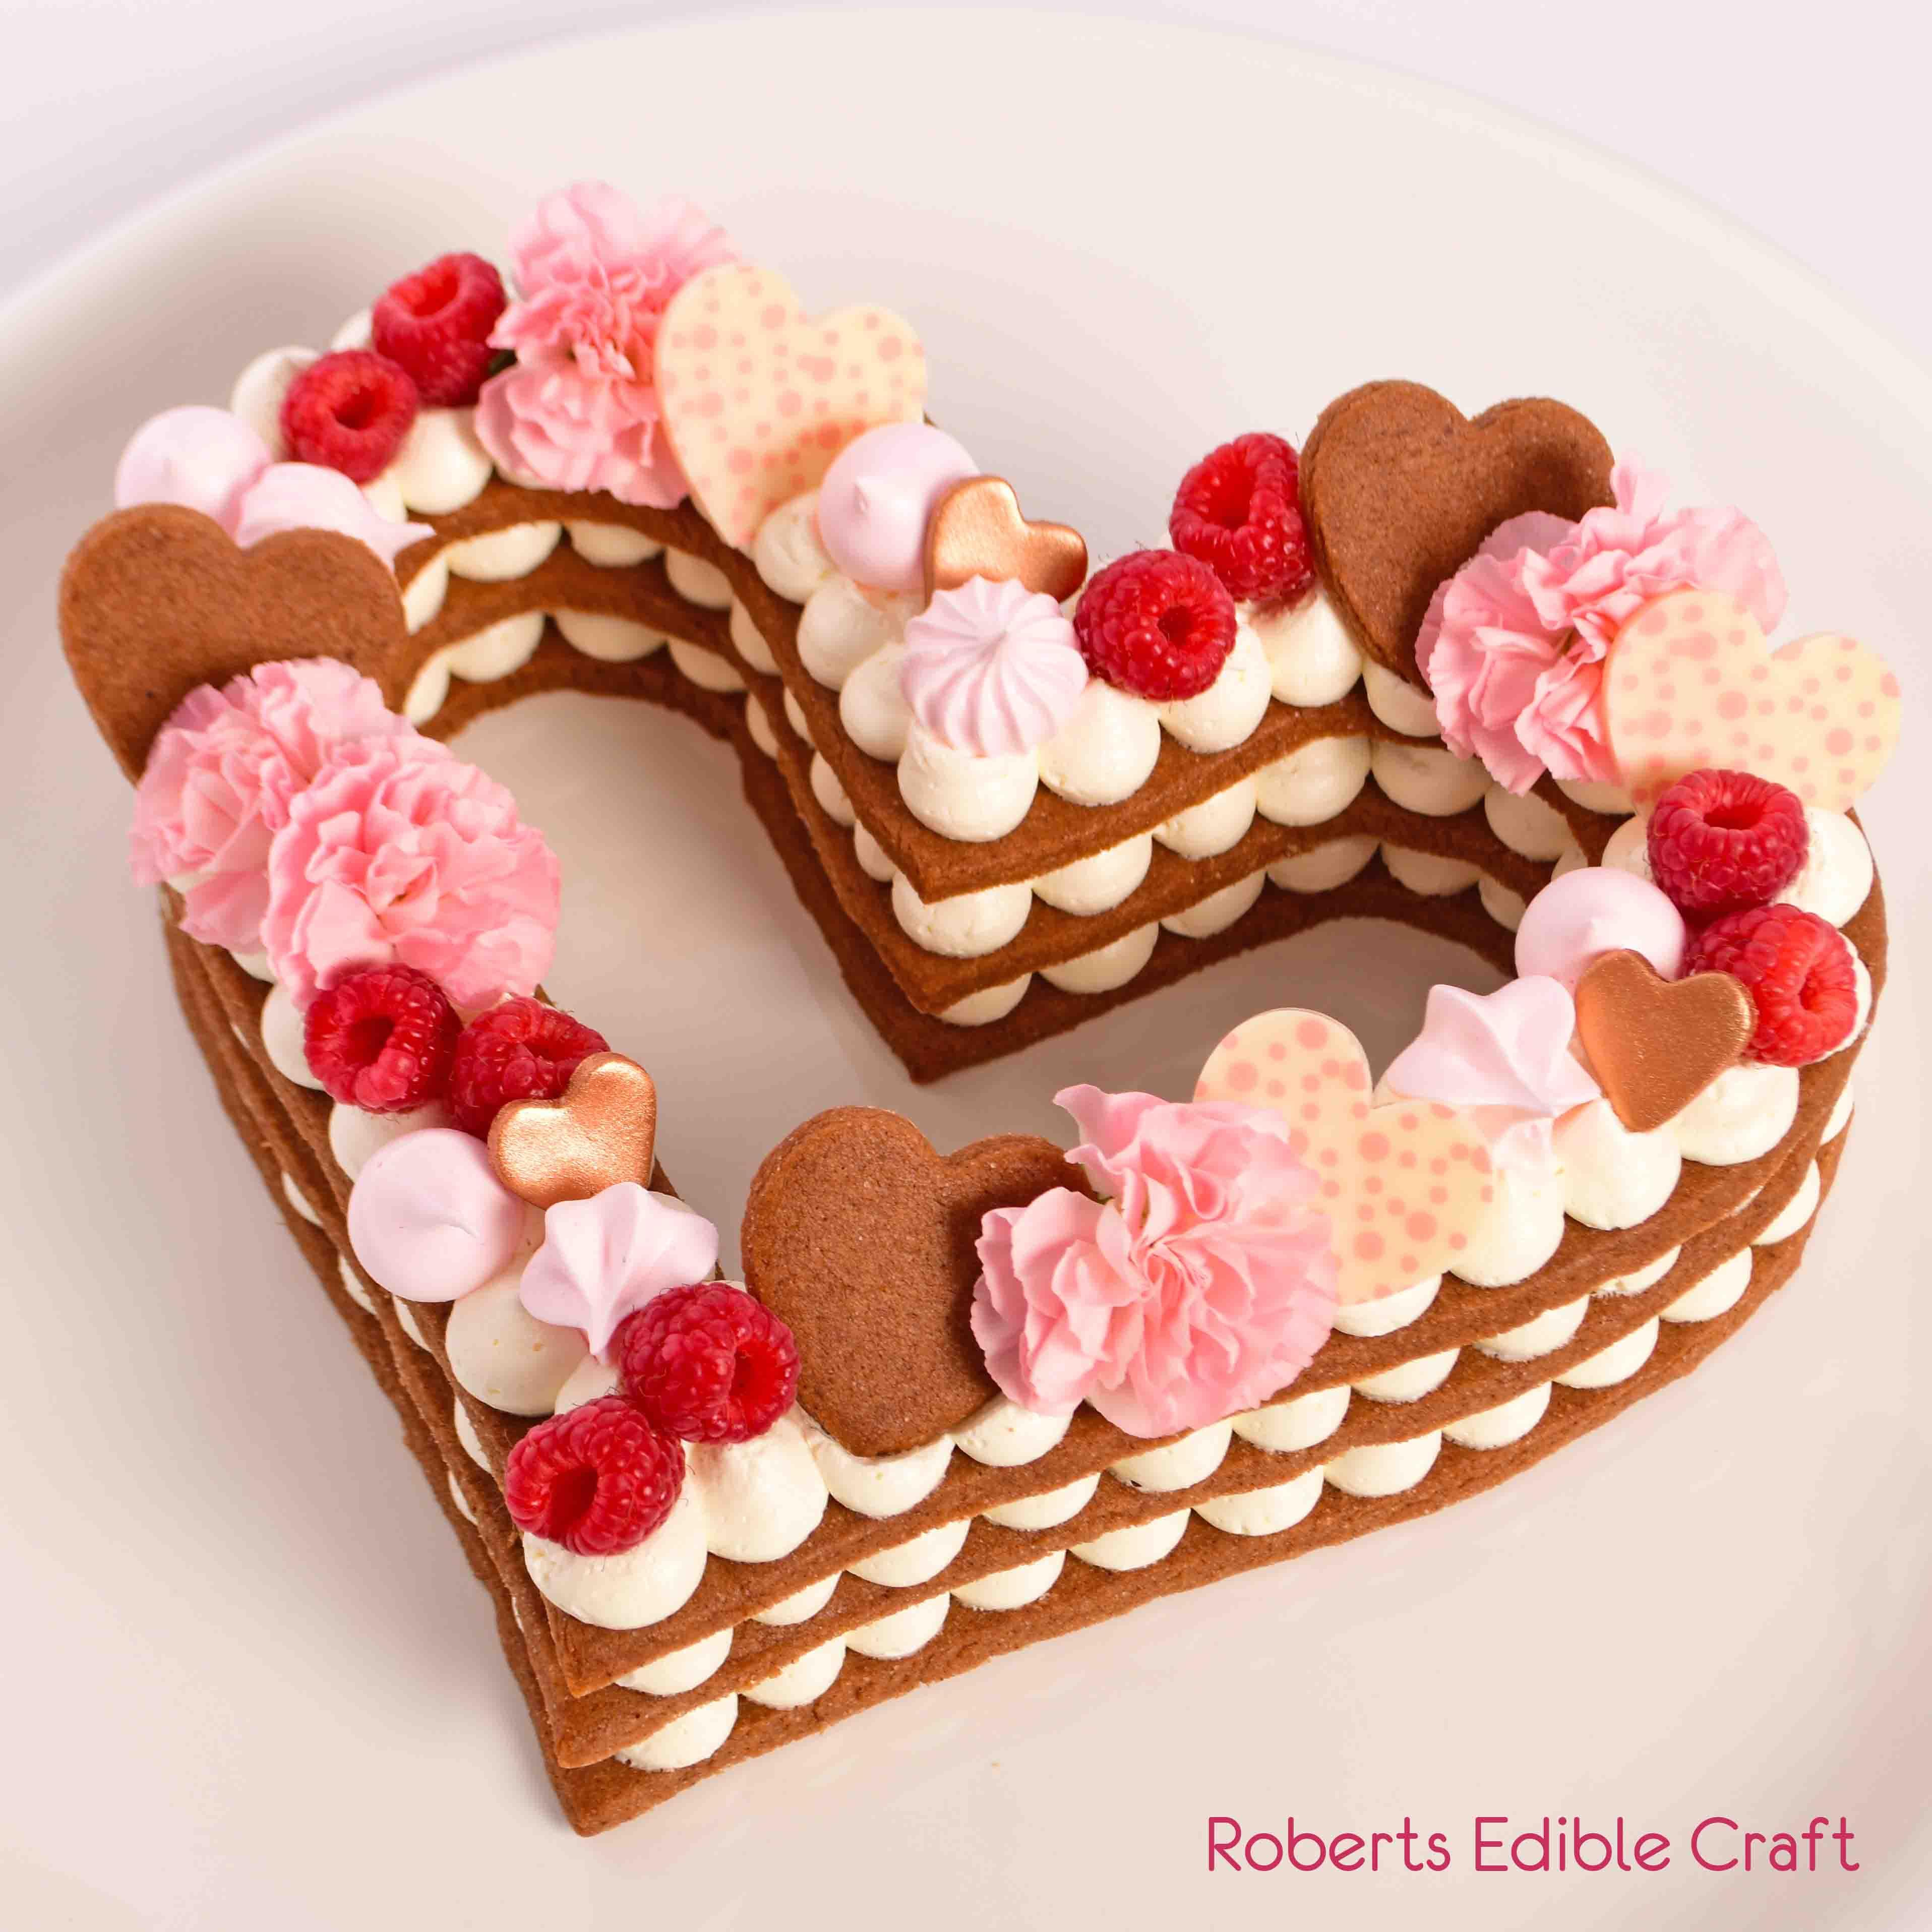 Roberts Edible Craft valentine-heart-biscuit-cake-069.jpg